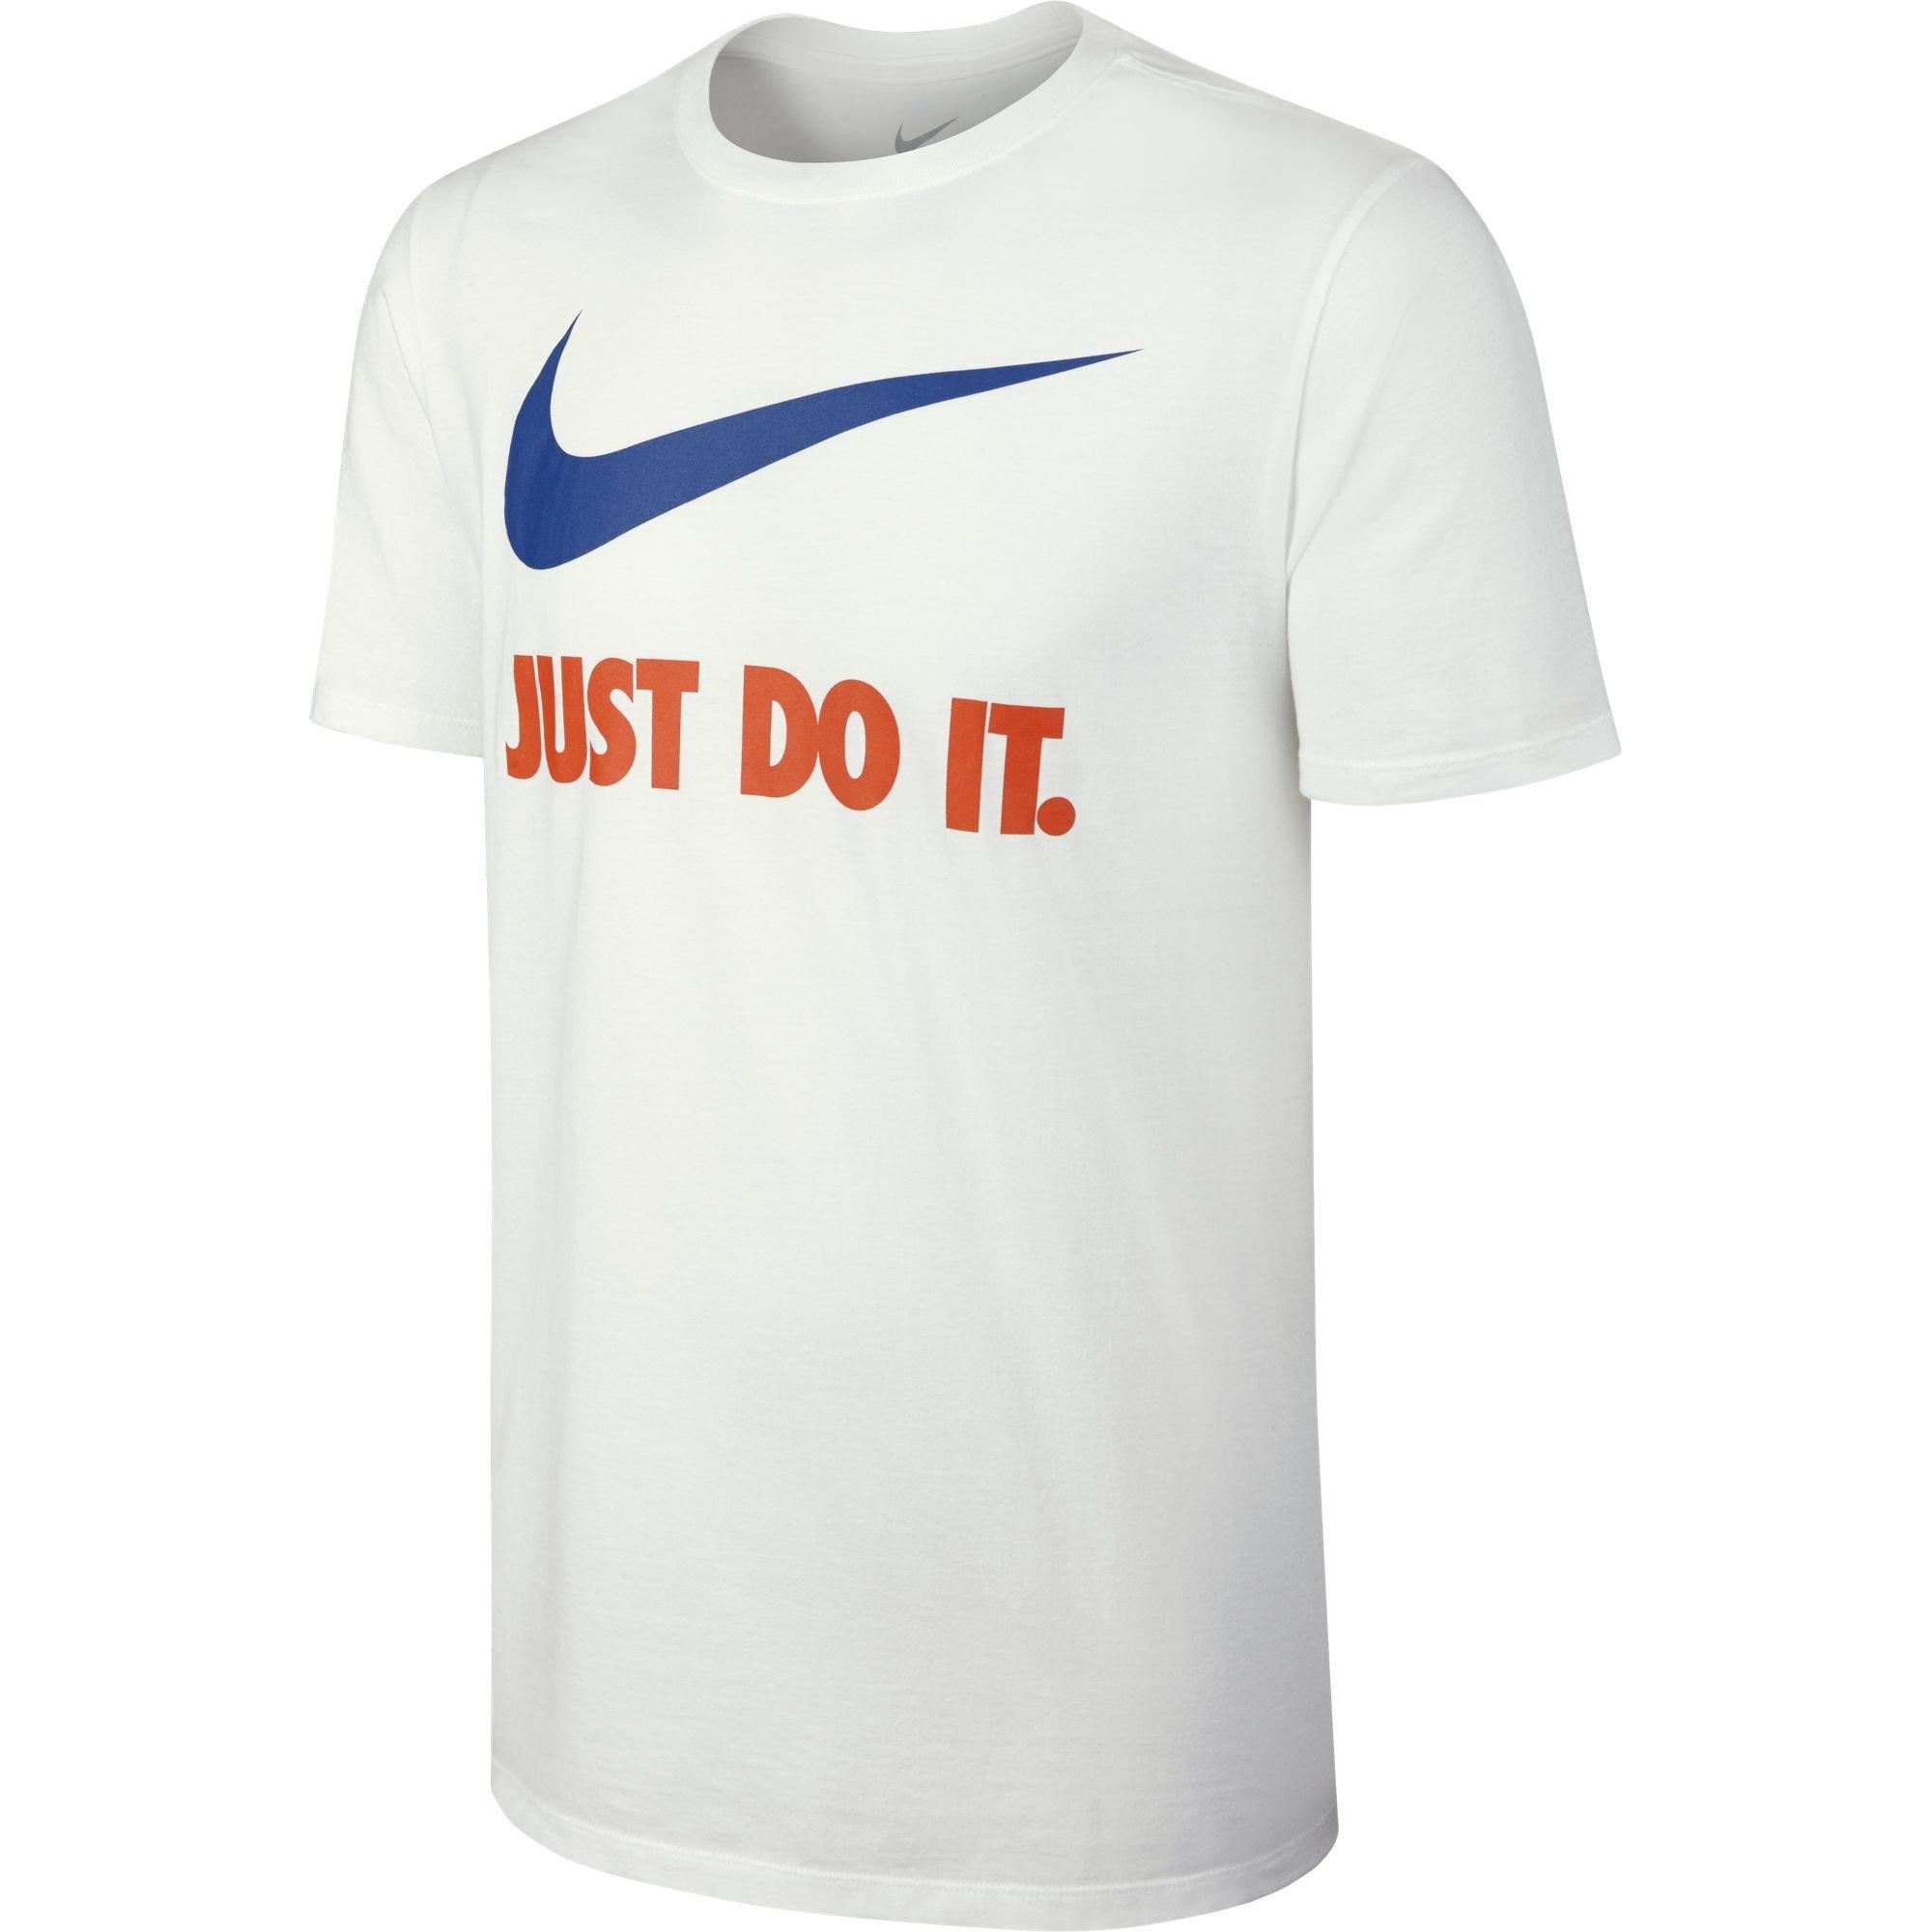 NIKE Sportswear Men's Just Do It Swoosh Tee, White/Team Orange/Team Royal, Medium